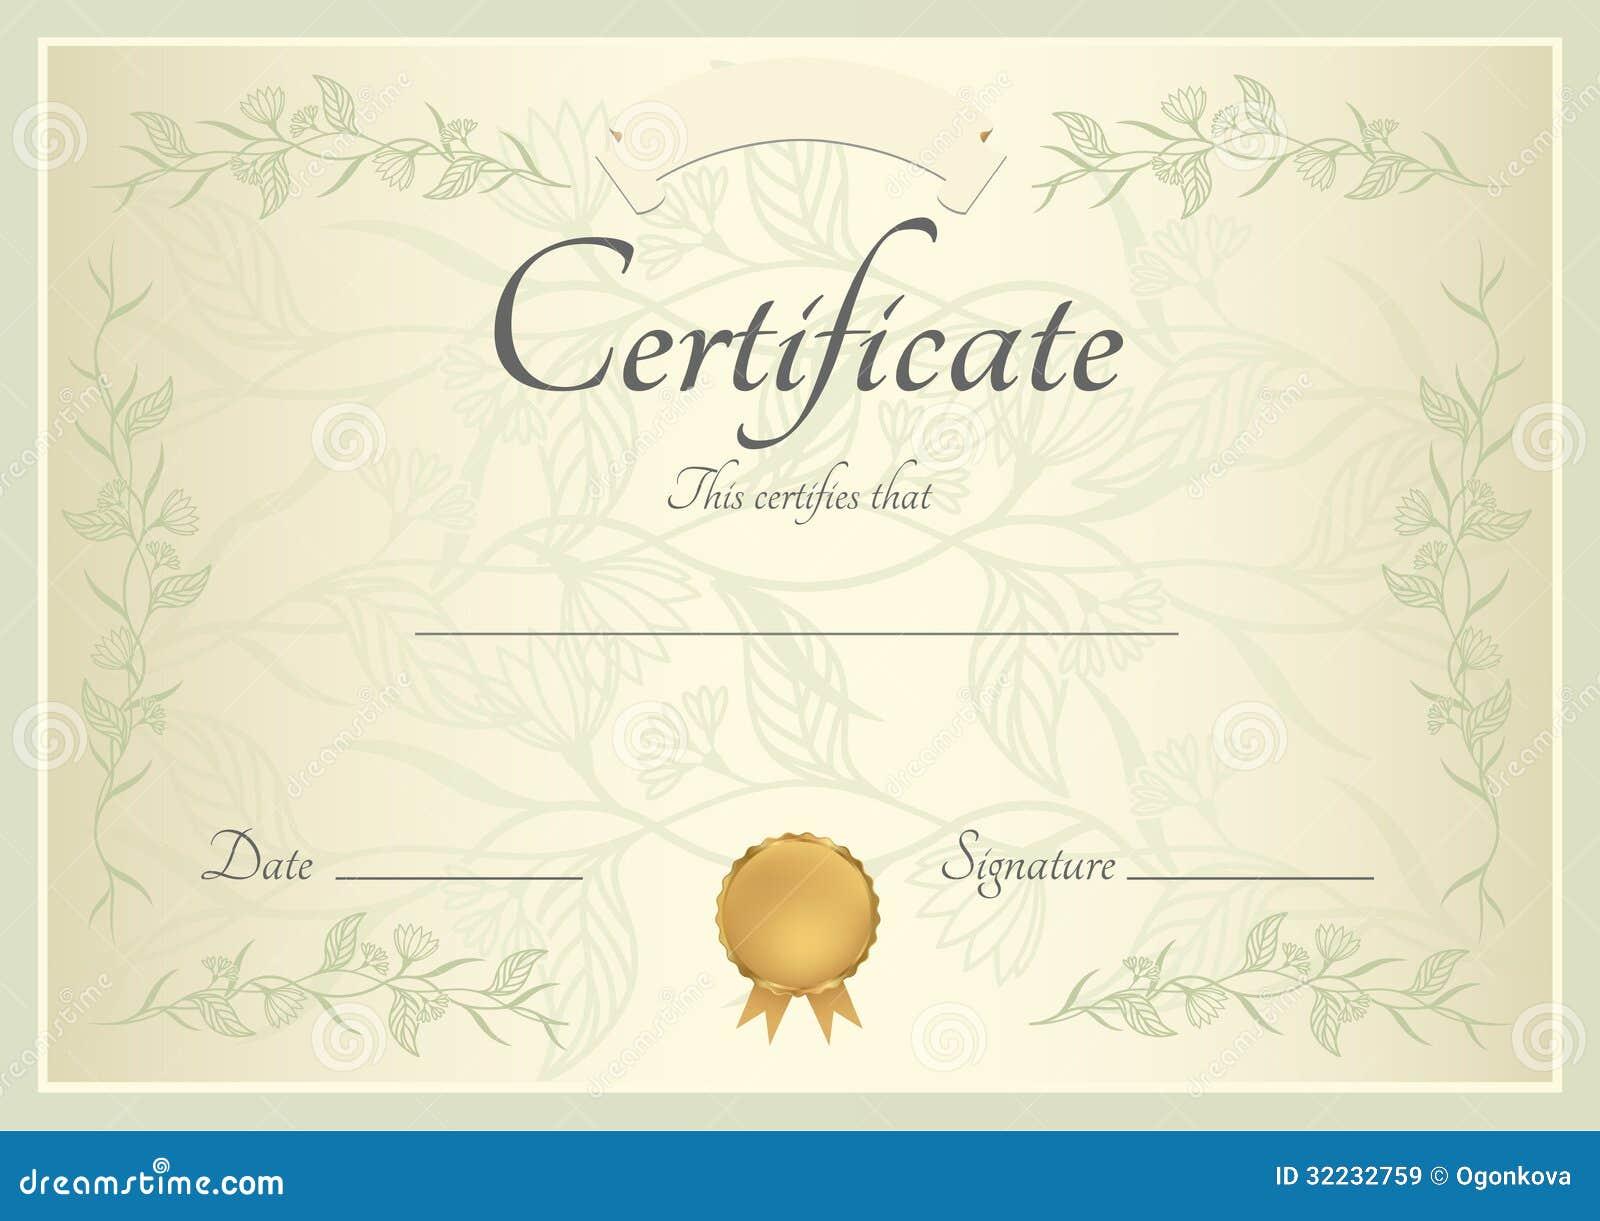 Fond De Certificat/diplu00f4me (calibre) Images libres de droits - Image ...